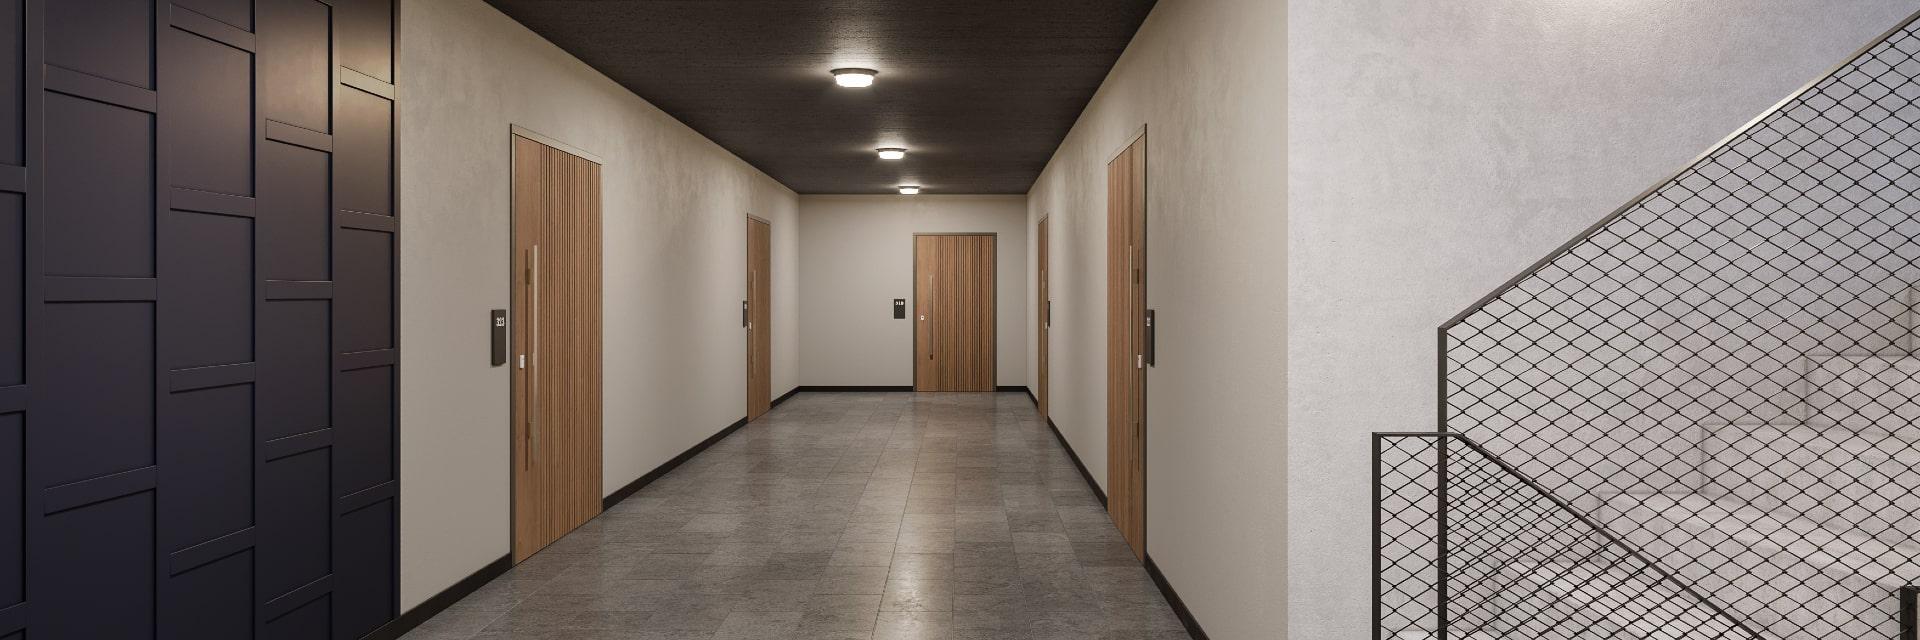 Protect 2.0 i tak i korridor